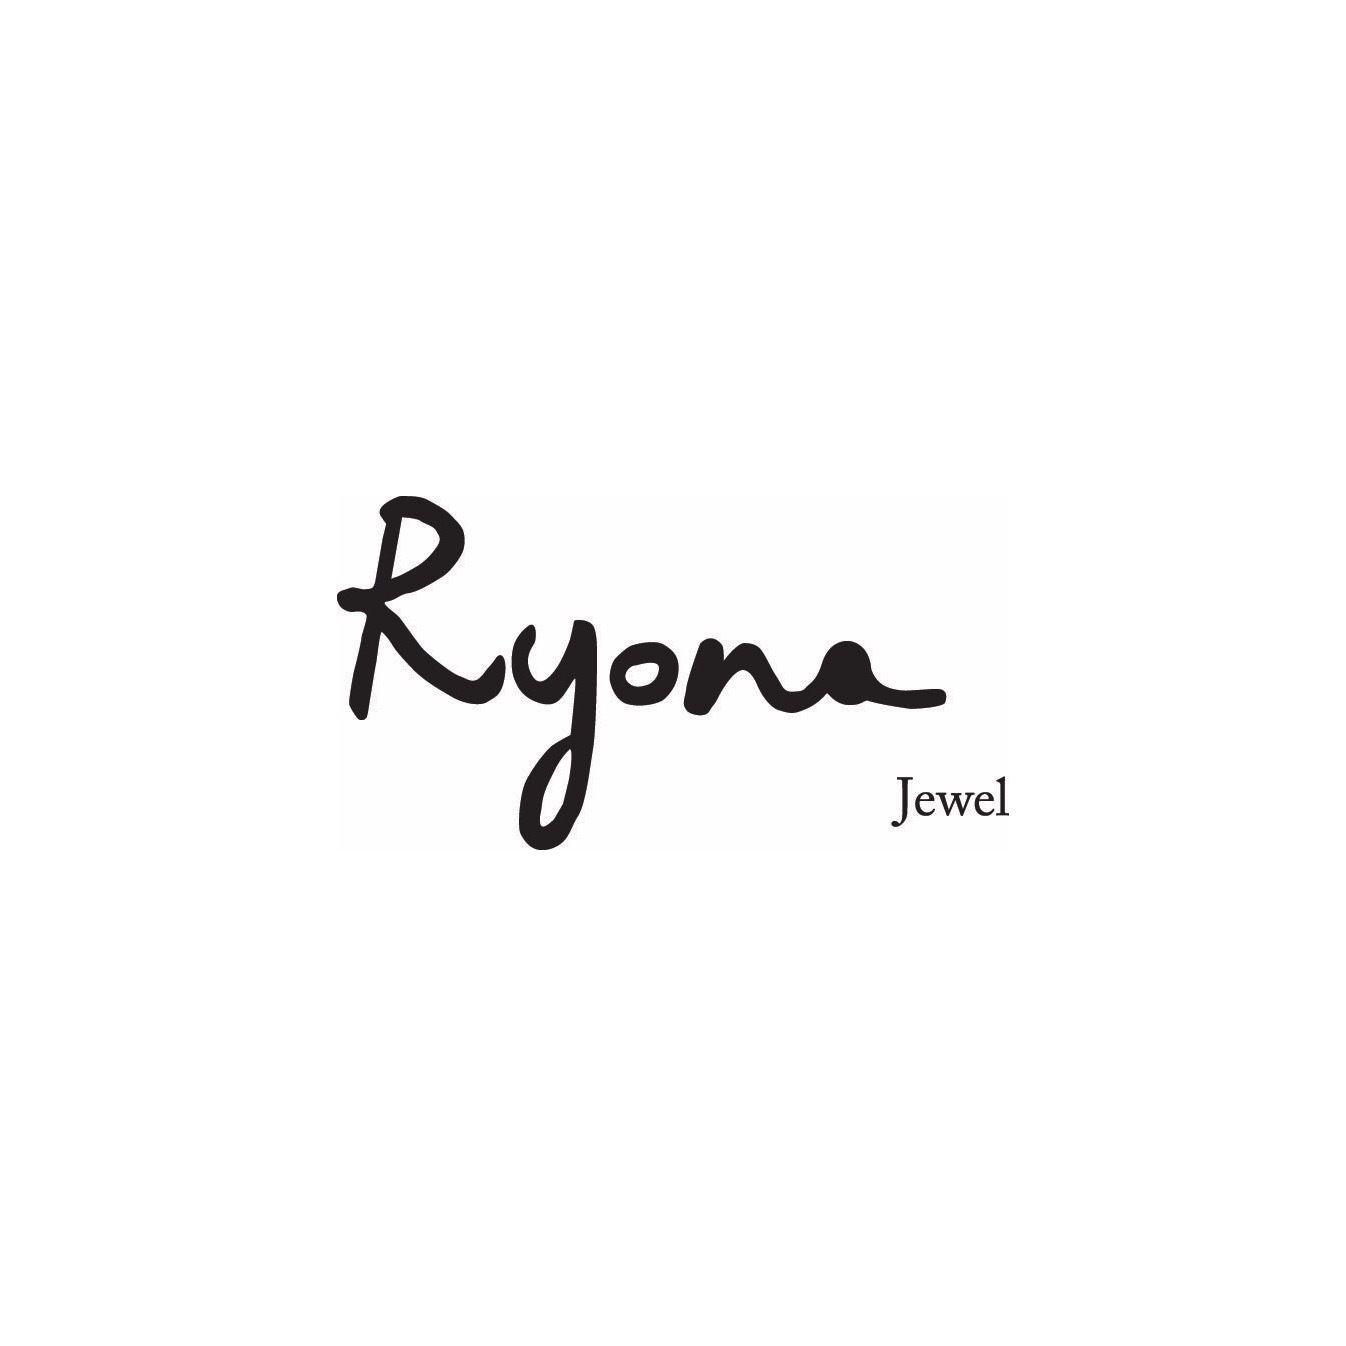 Ryona